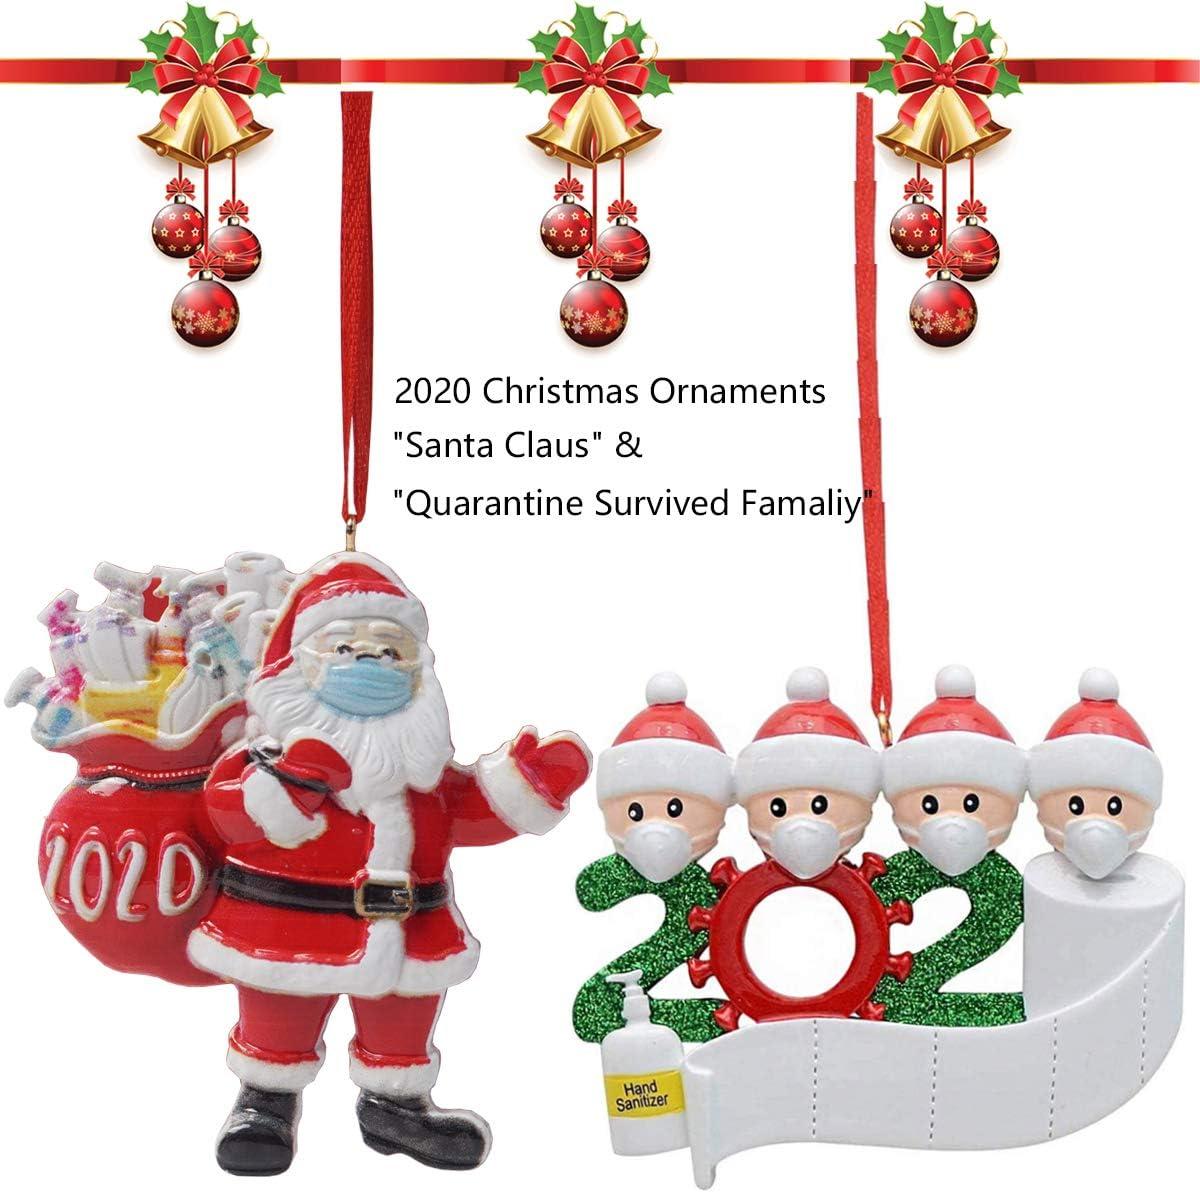 2020 Creative Christmas Hanging Decorations Ornaments, DIY Quarantine Survivor Family & Santa Claus with Faca Mask Hanging Pendant Customized for Xmas Tree Home Indoor Decor, Memorable Gifts Keepsake